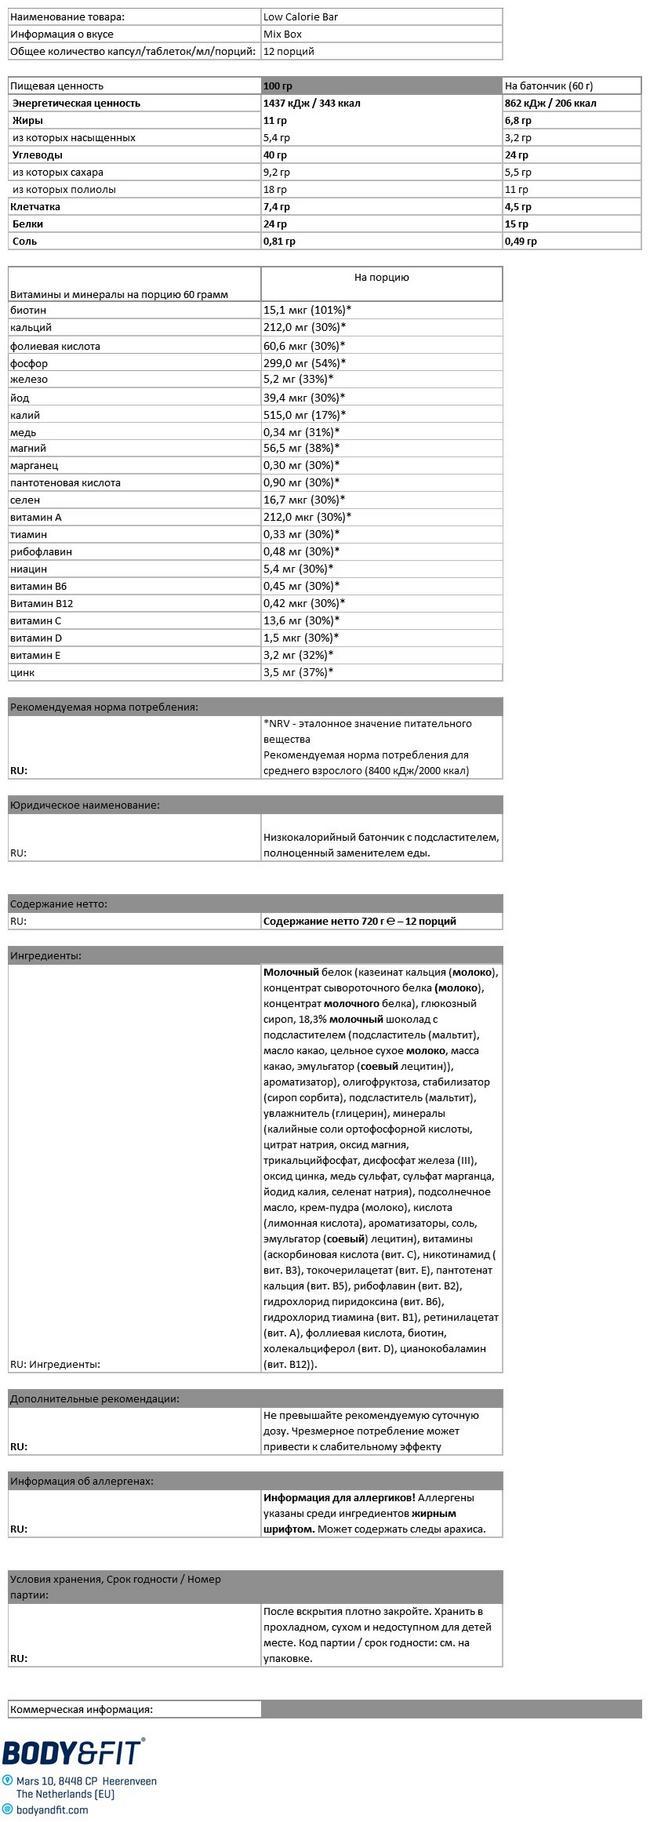 Низкокалорийный батончик Nutritional Information 1